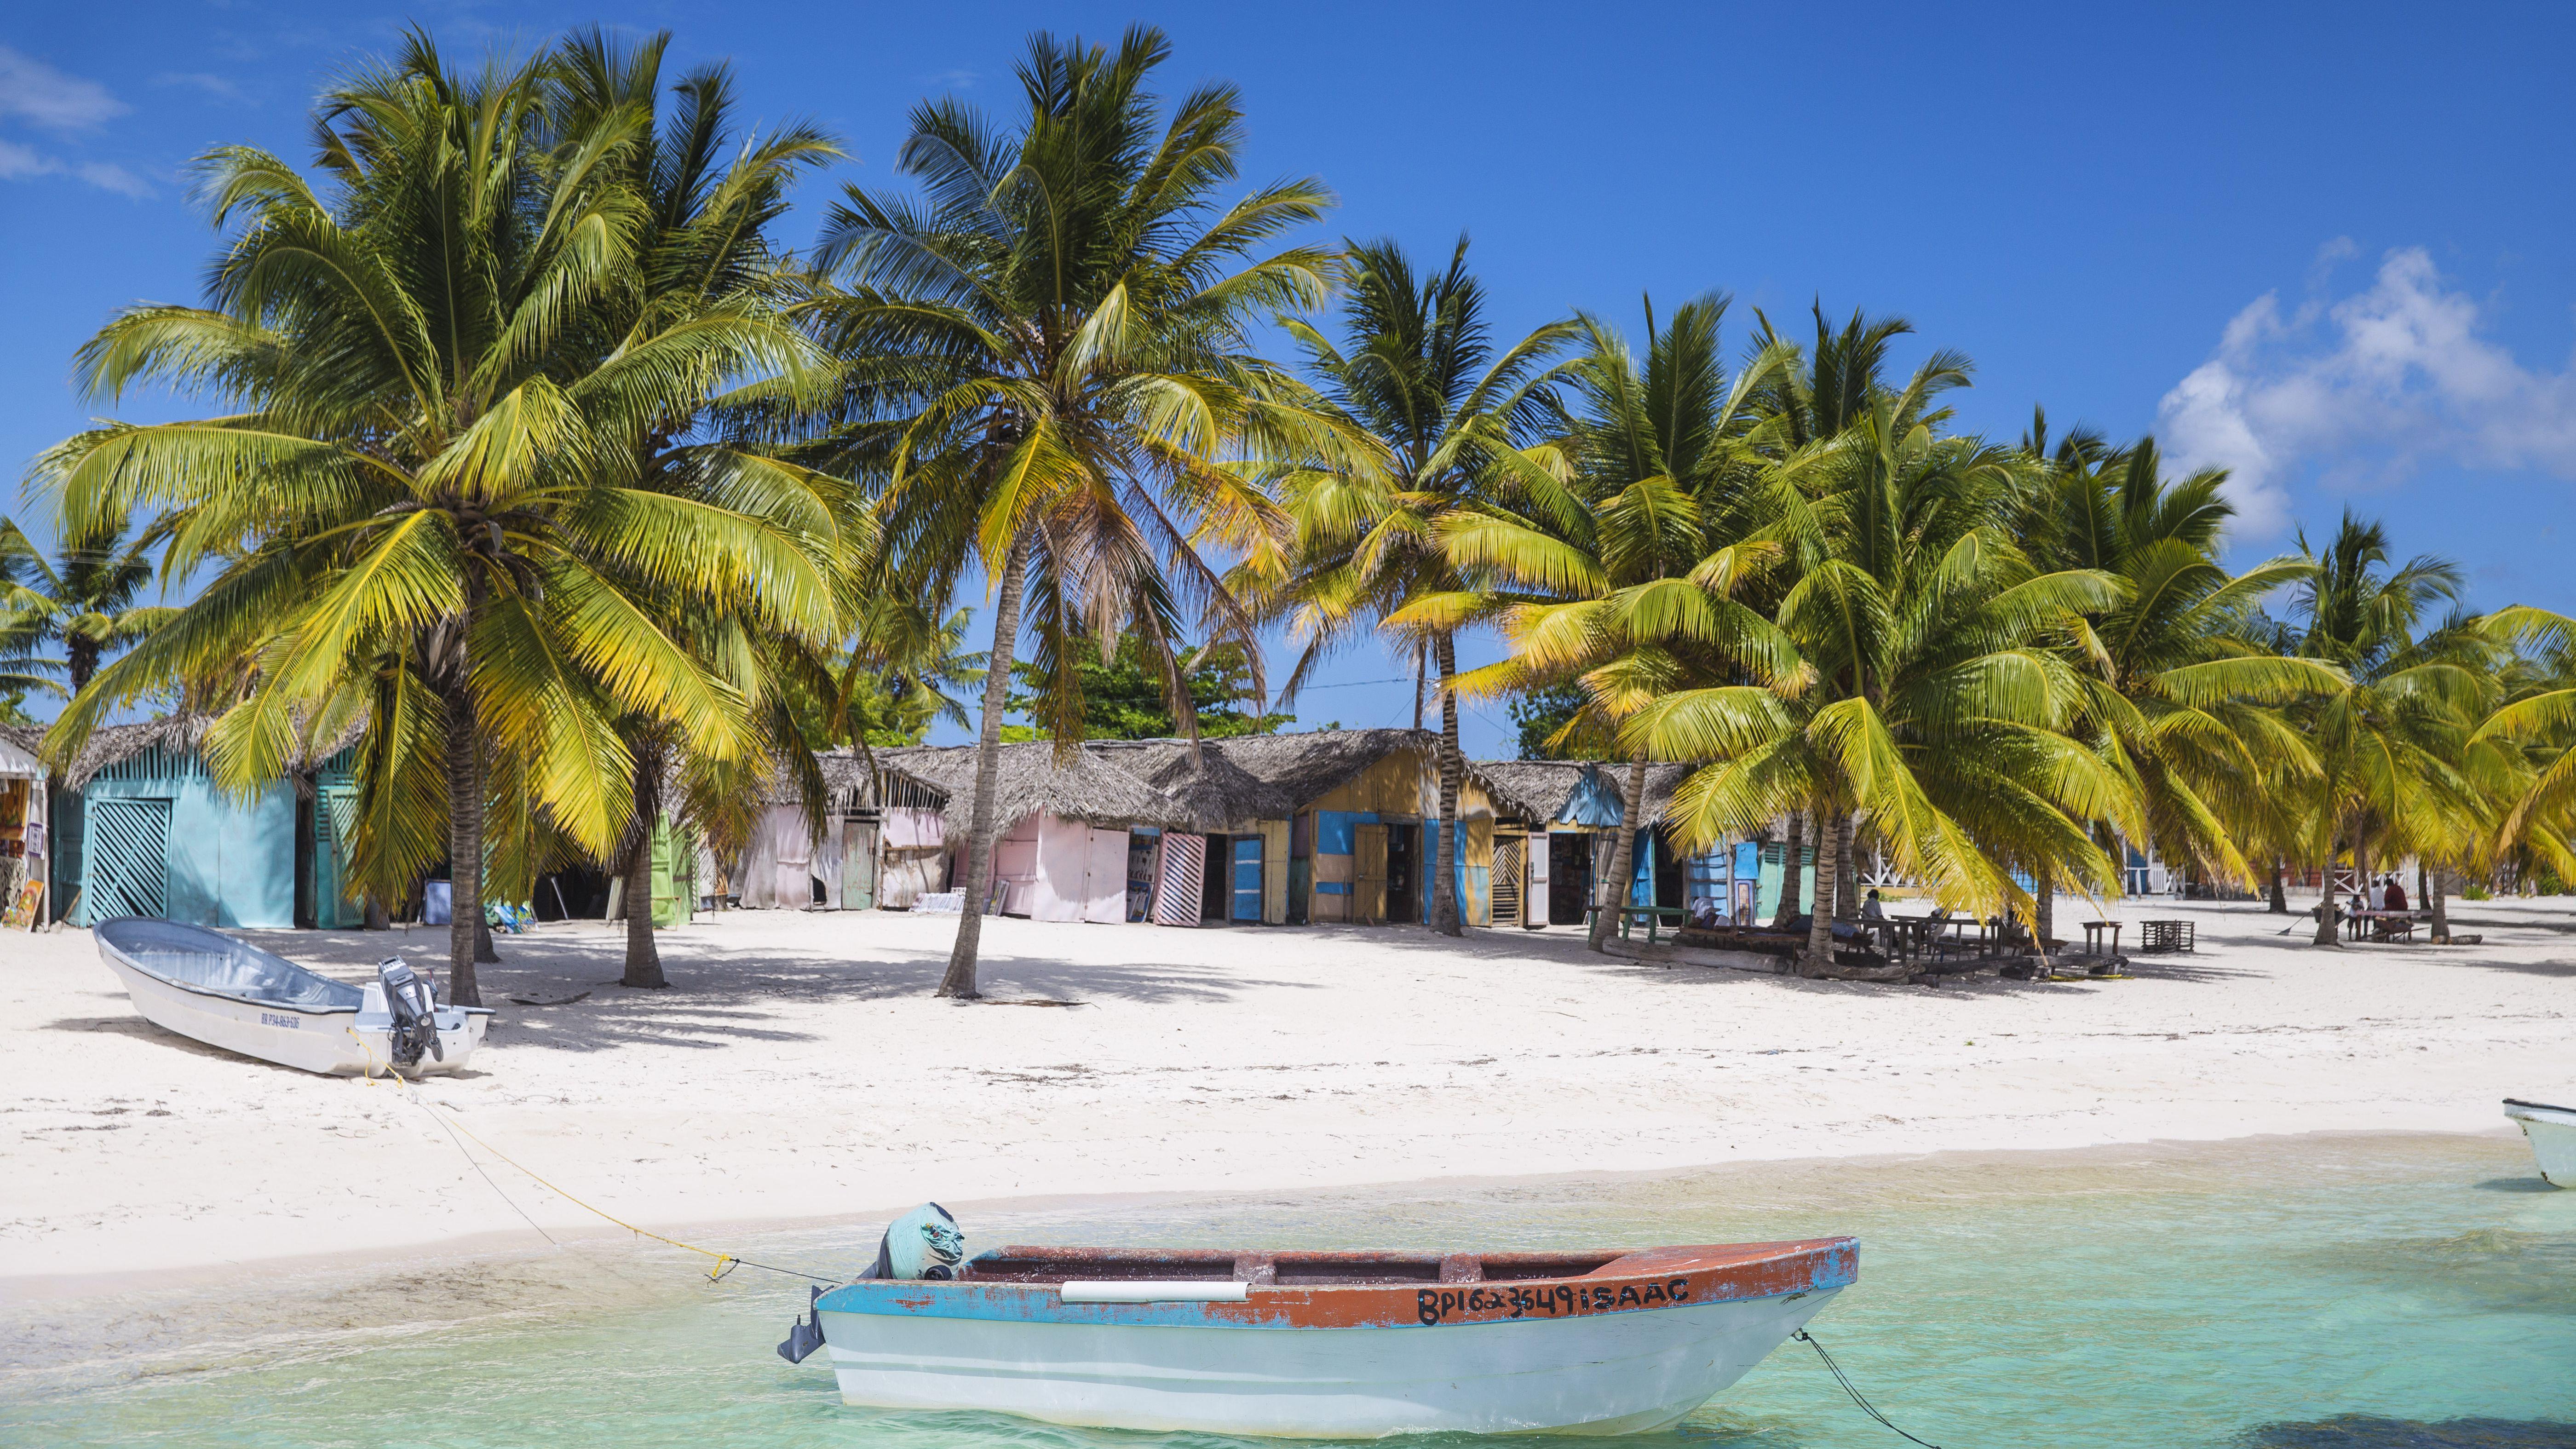 668bacc5f2 Best Caribbean Island Honeymoon Destinations